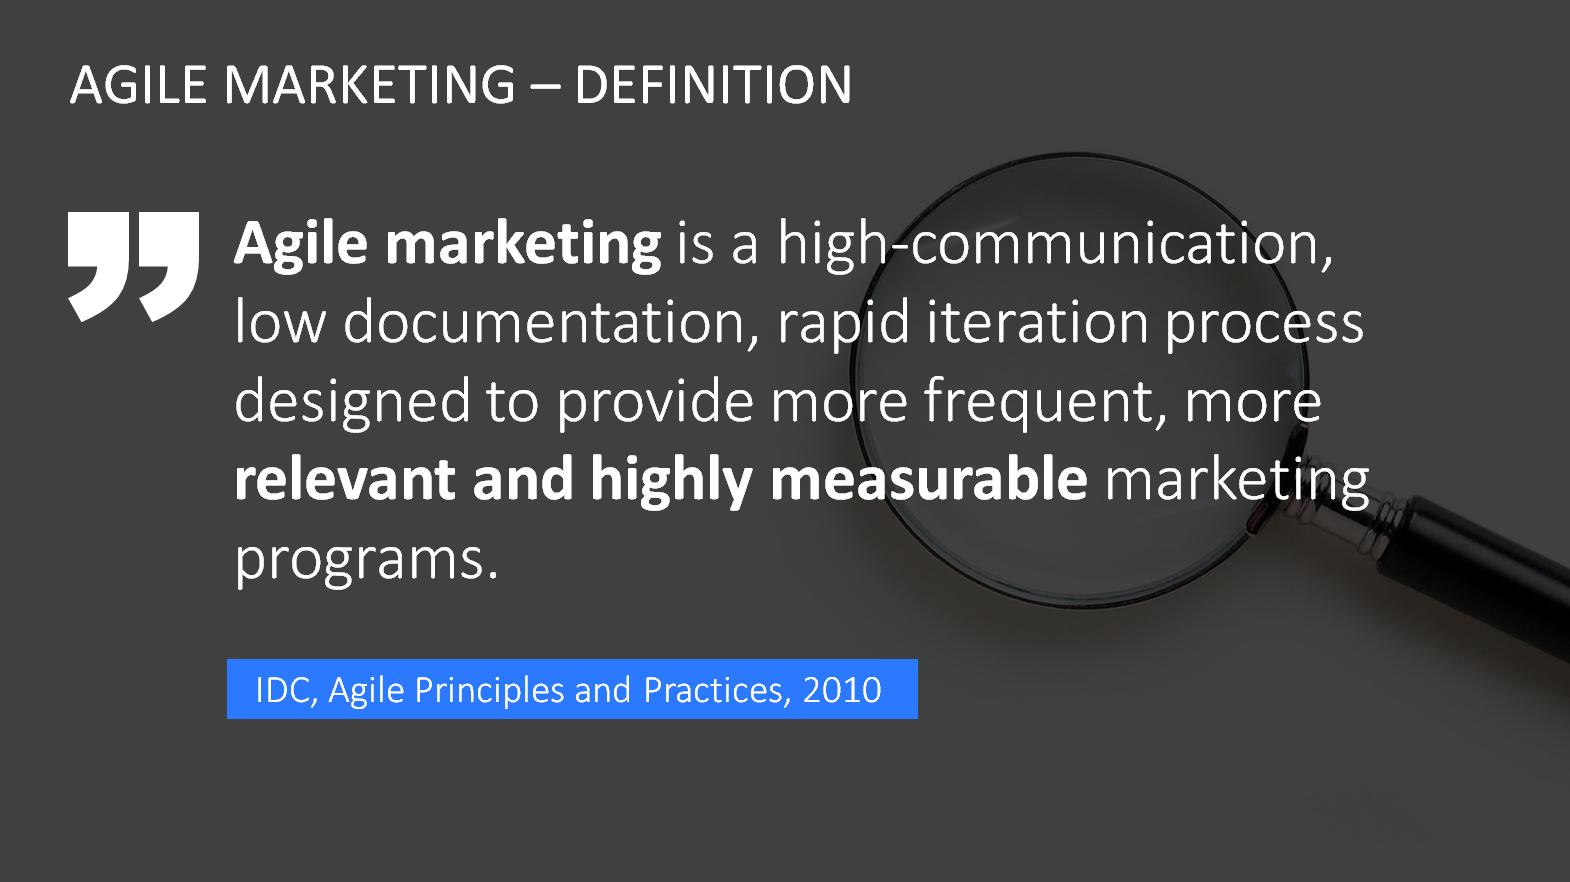 agile-marketing-definition